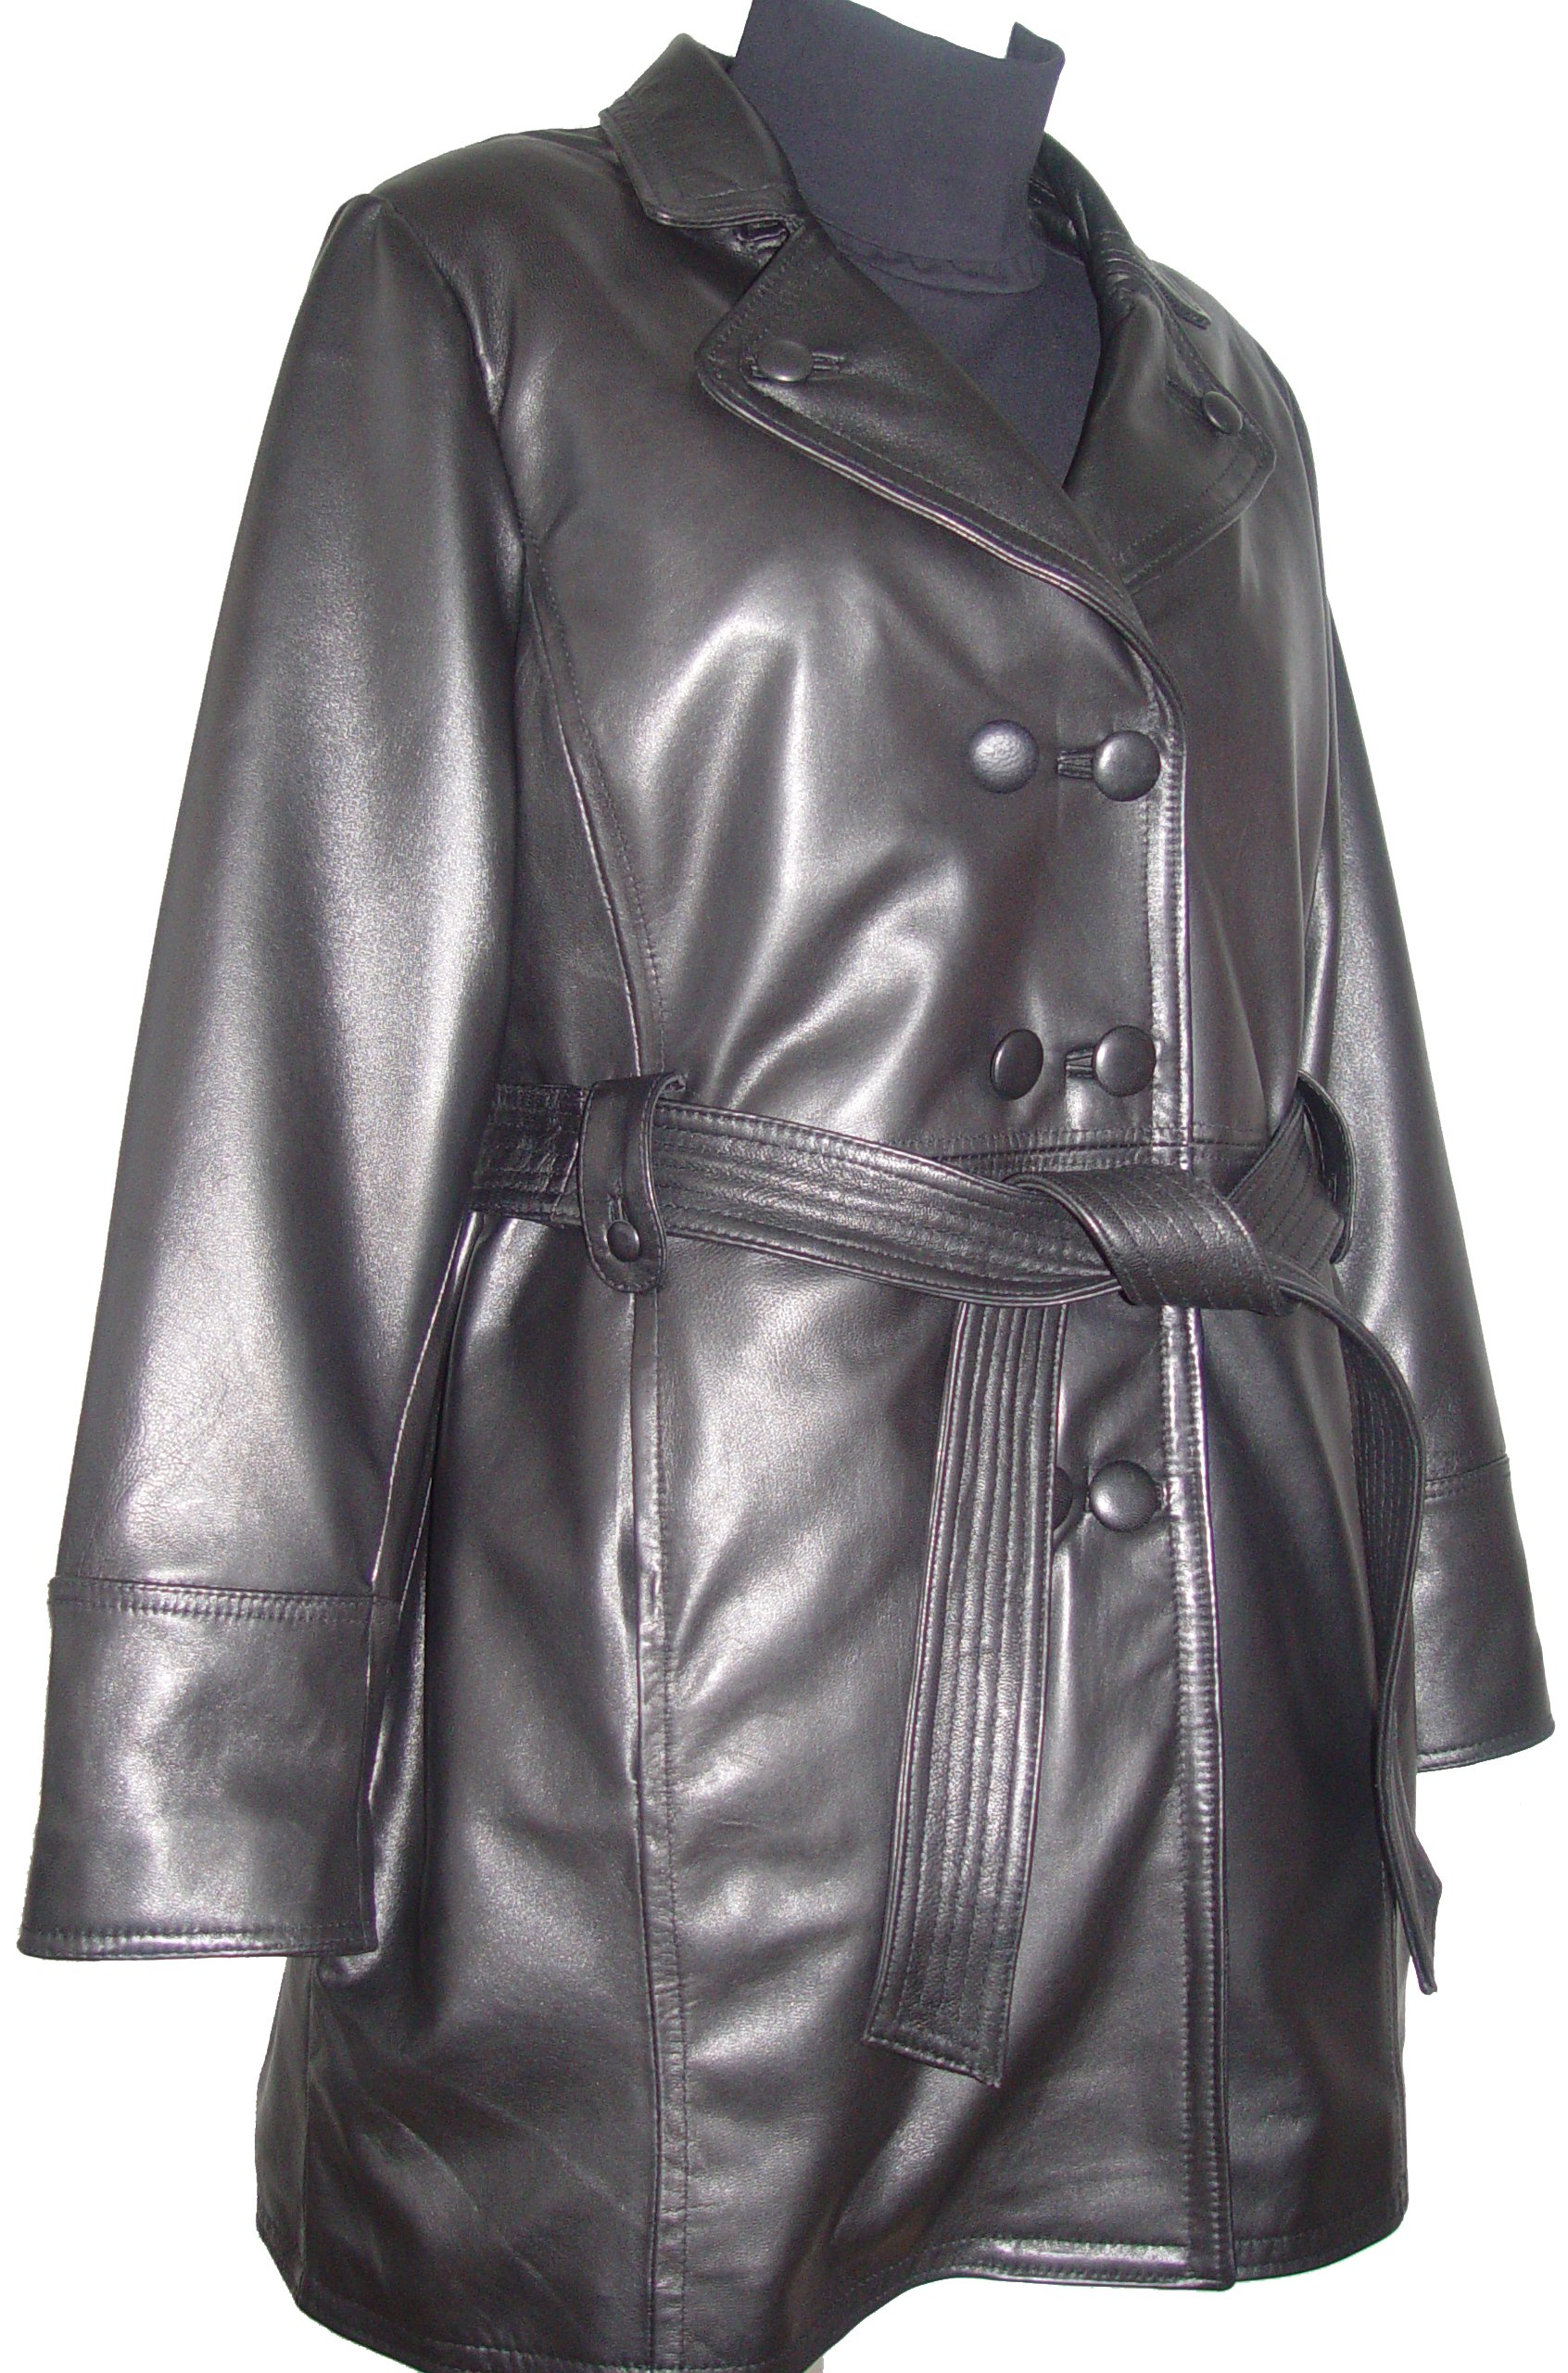 Johnnyblue 4 Season Wear Womens 5006 PETITE & ALL SIZELambskin Leather Trench Coat by Johnnyblue (Image #7)